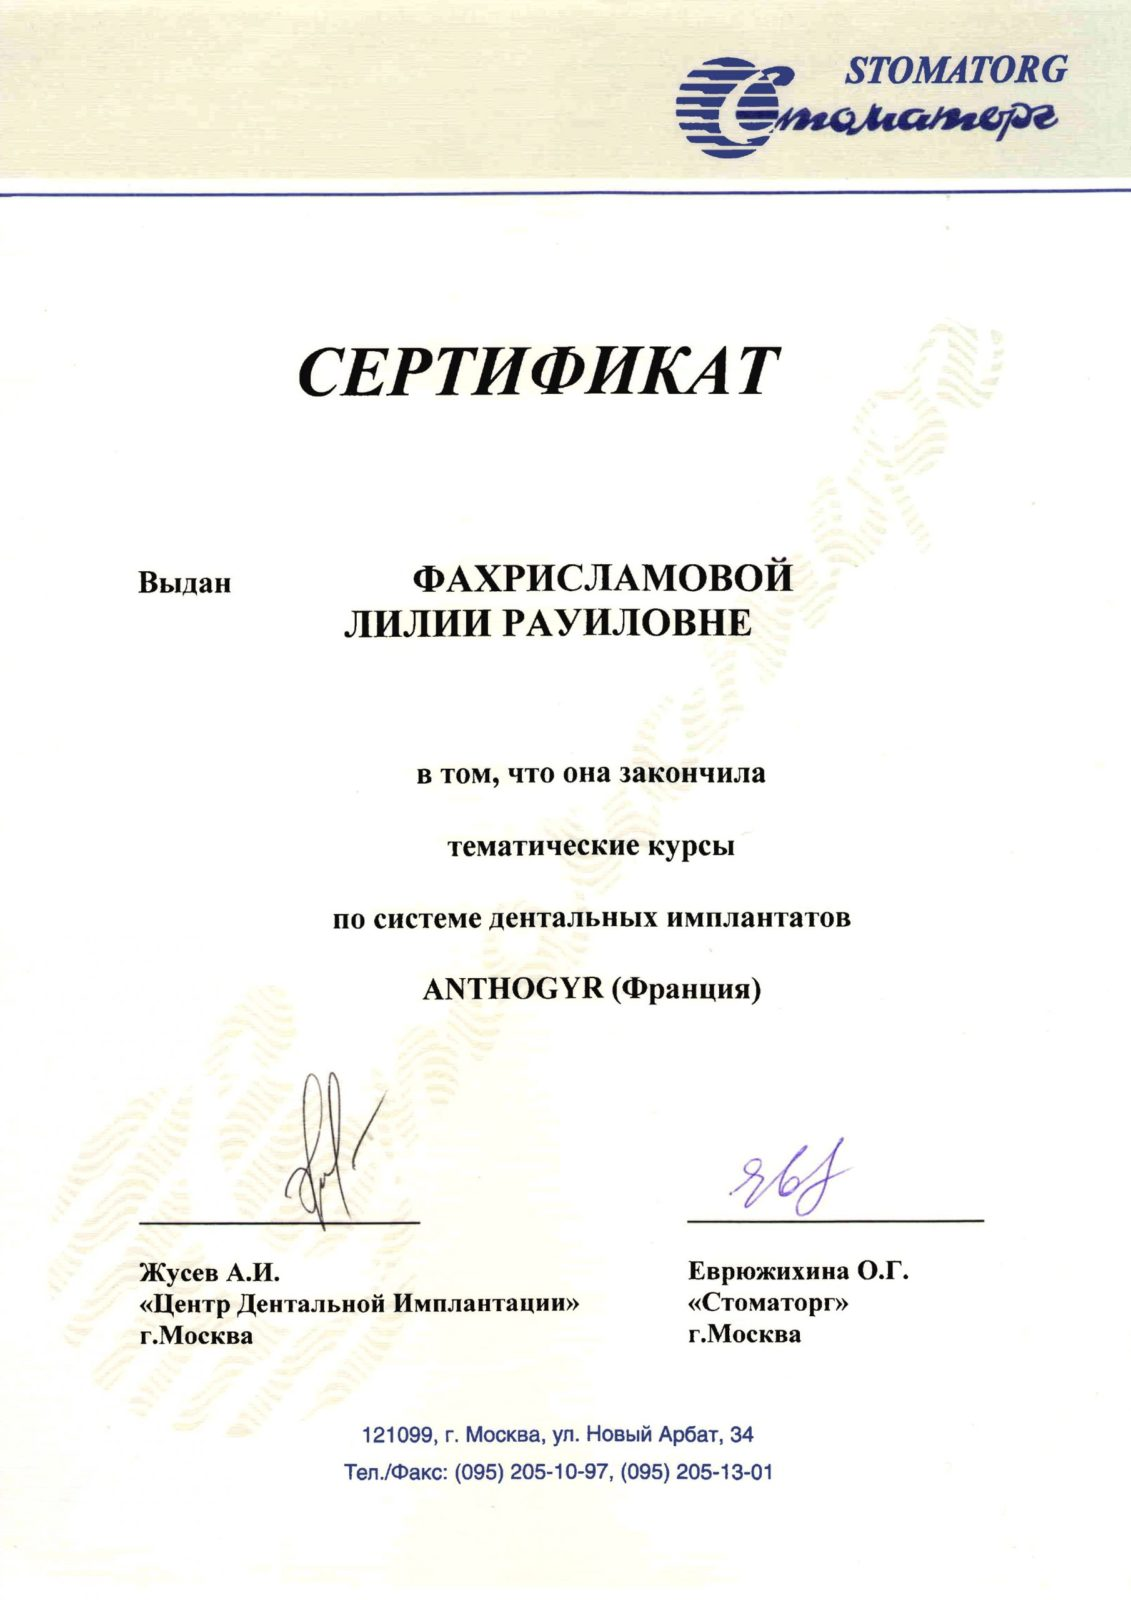 https://oris-vidnoe.ru/wp-content/uploads/2021/05/11-scaled.jpeg